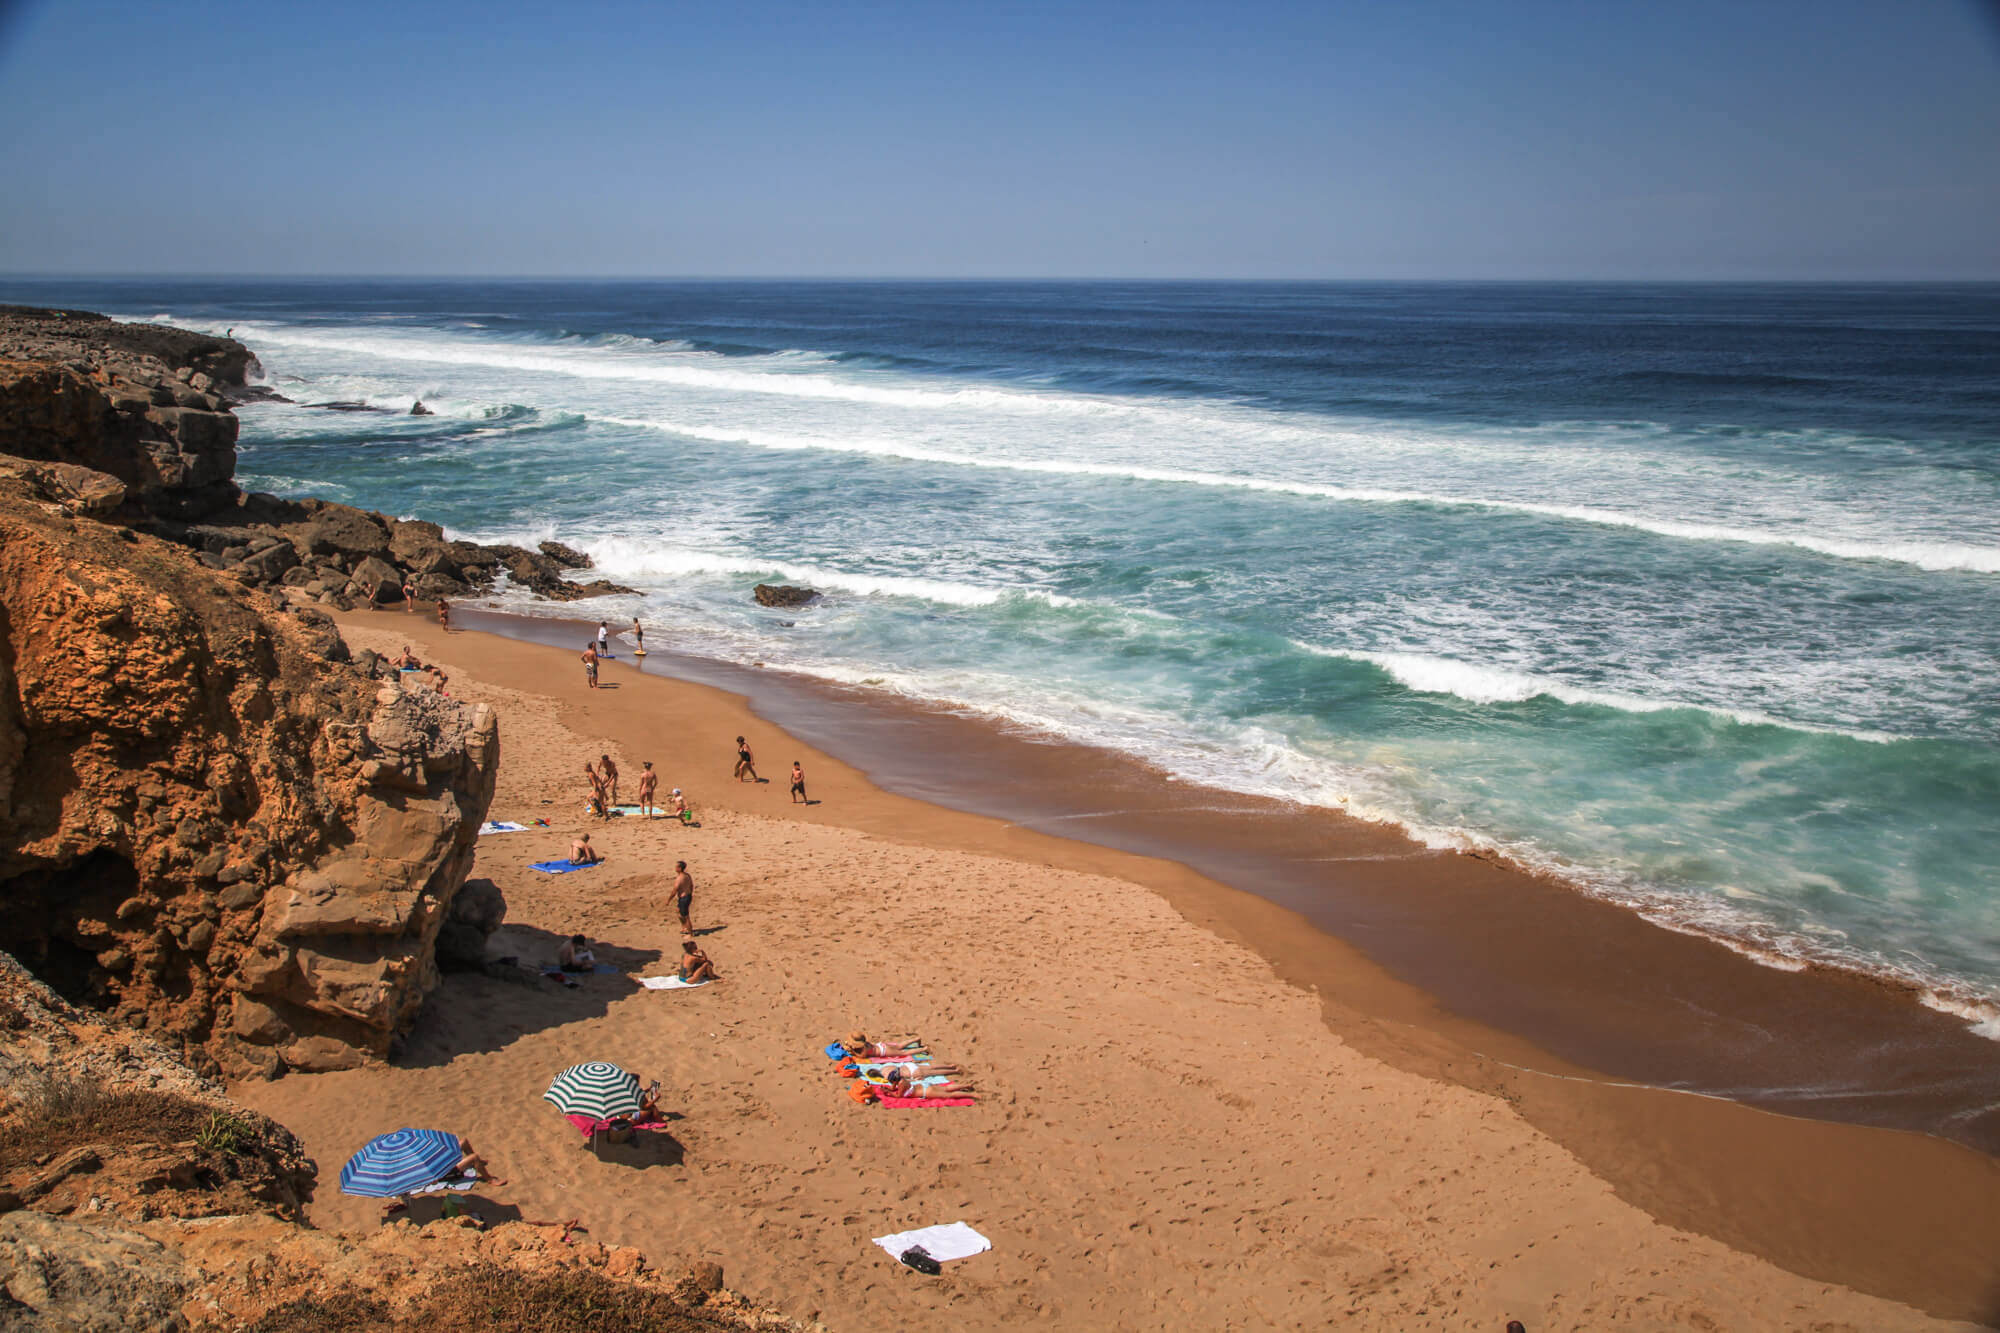 Praia do Guincho waves